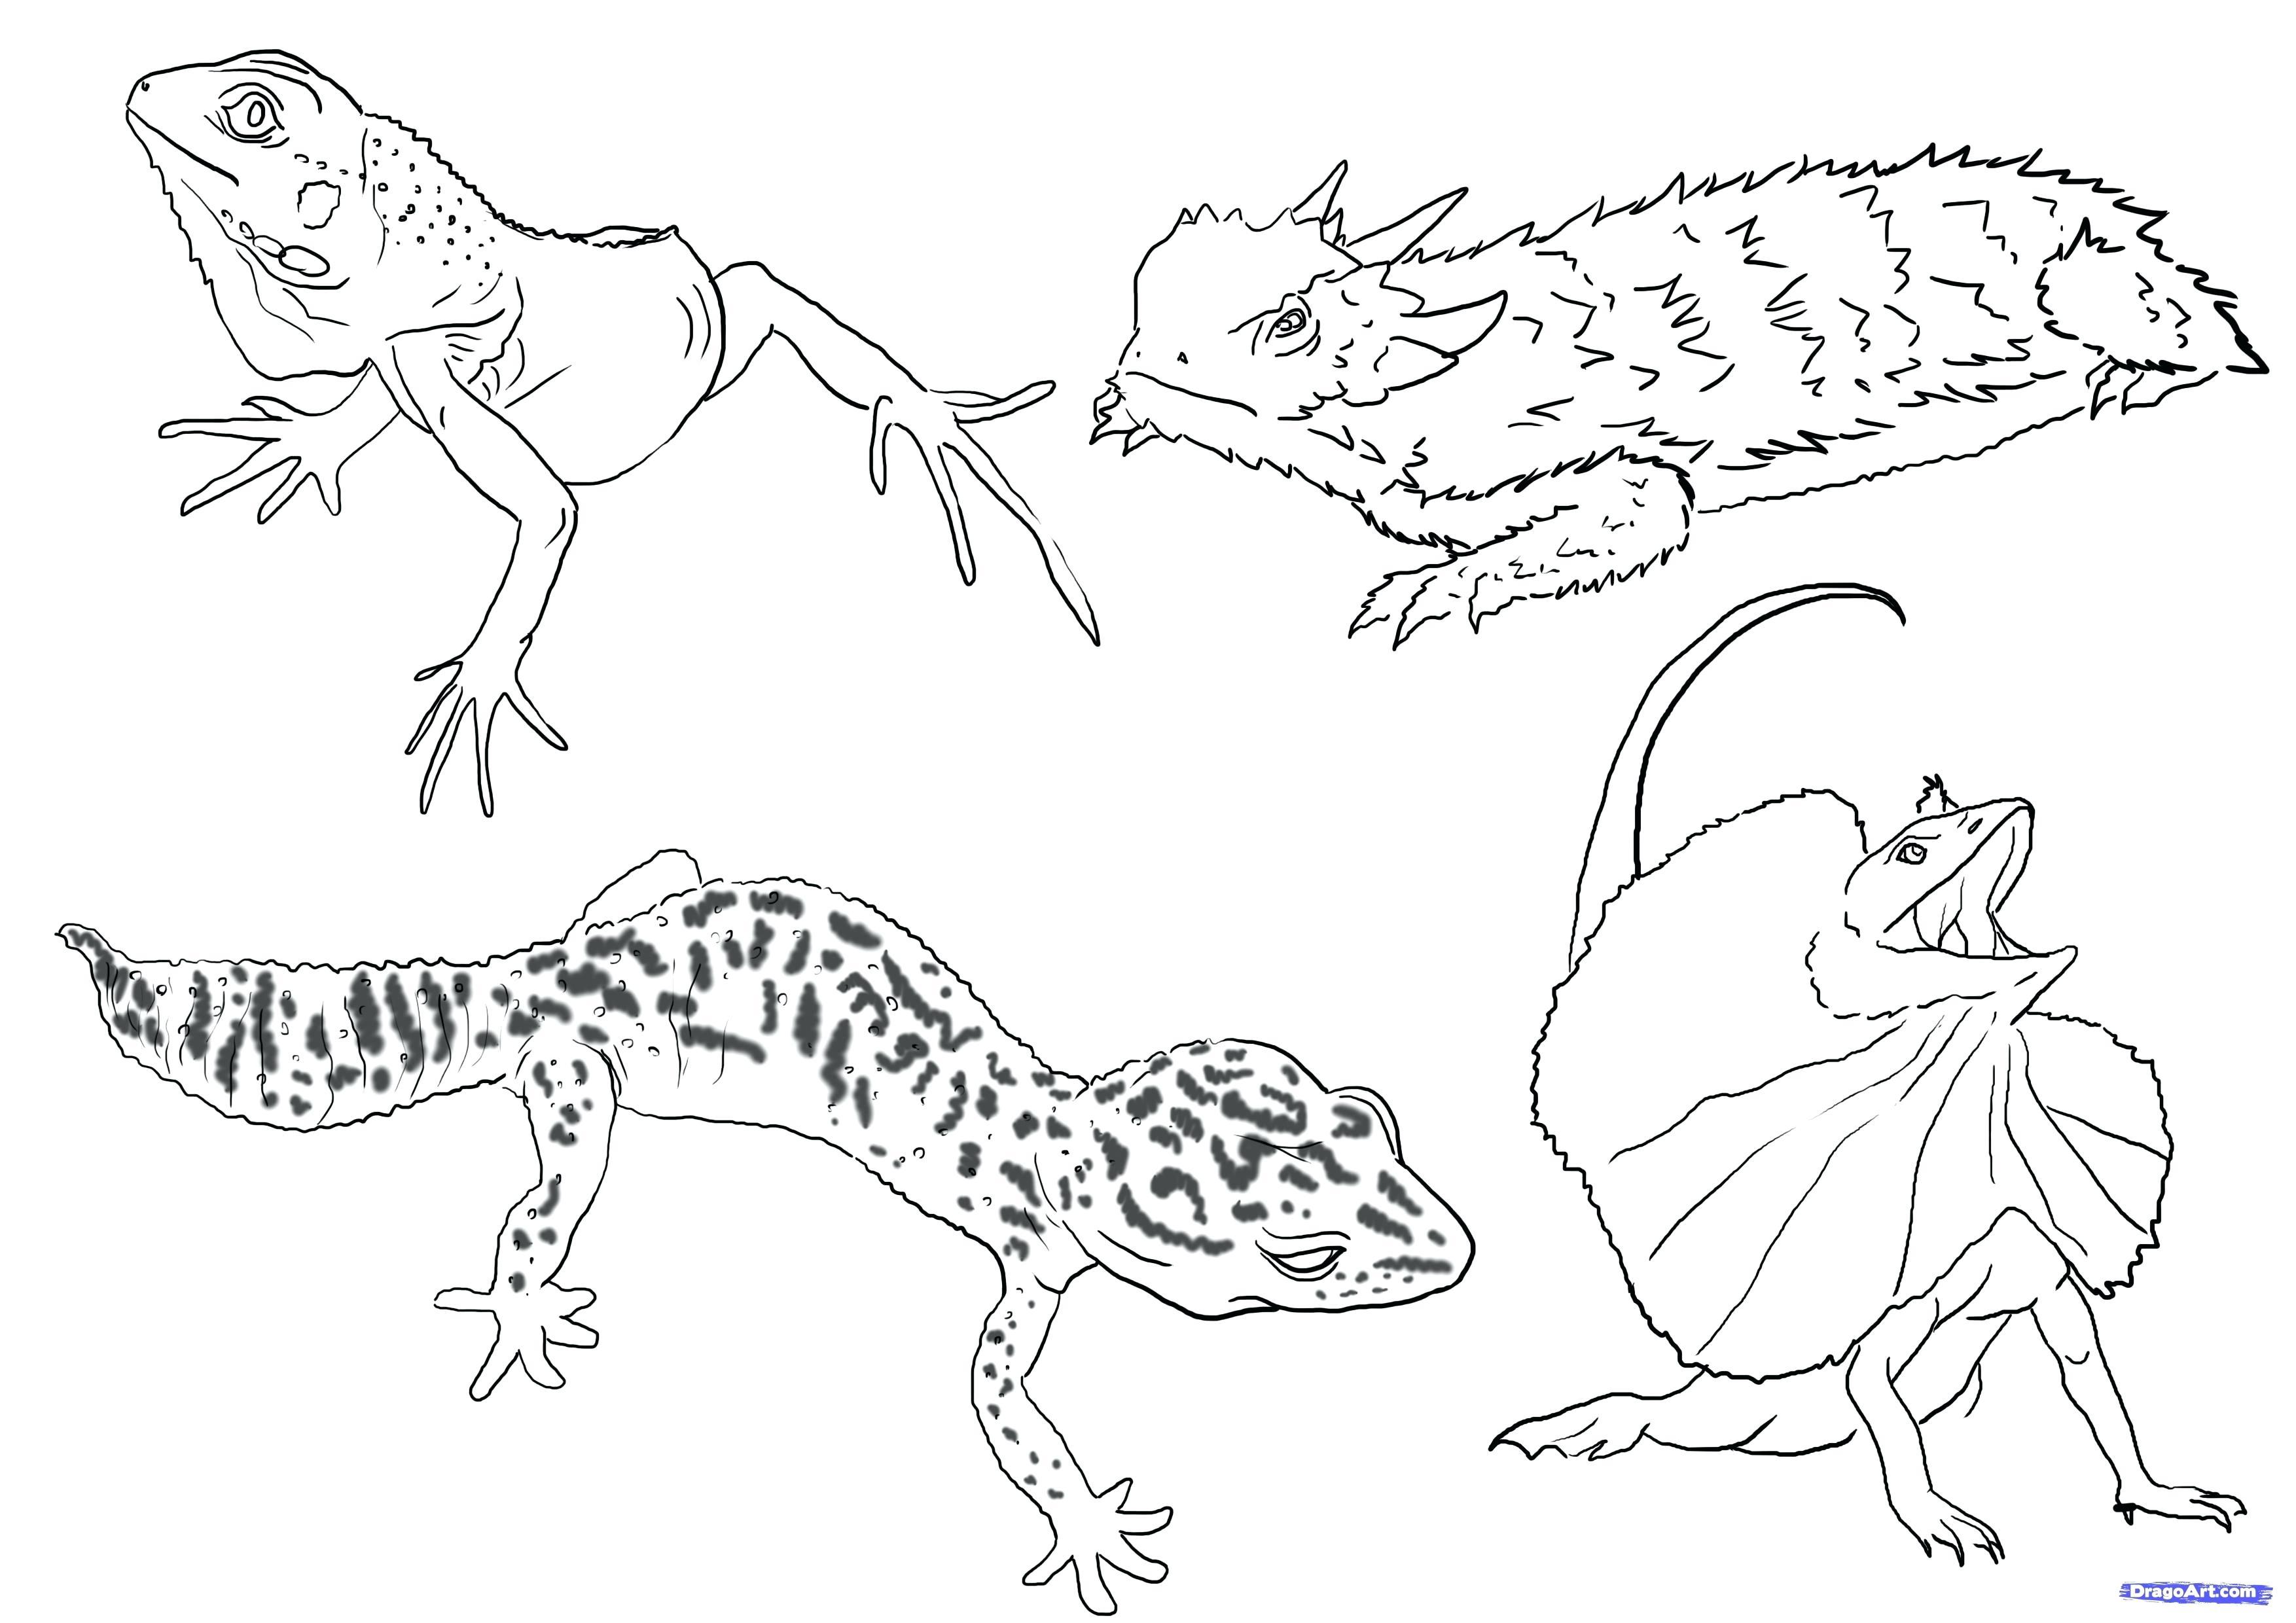 Reptiles Drawing at GetDrawings.com | Free for personal use Reptiles ...